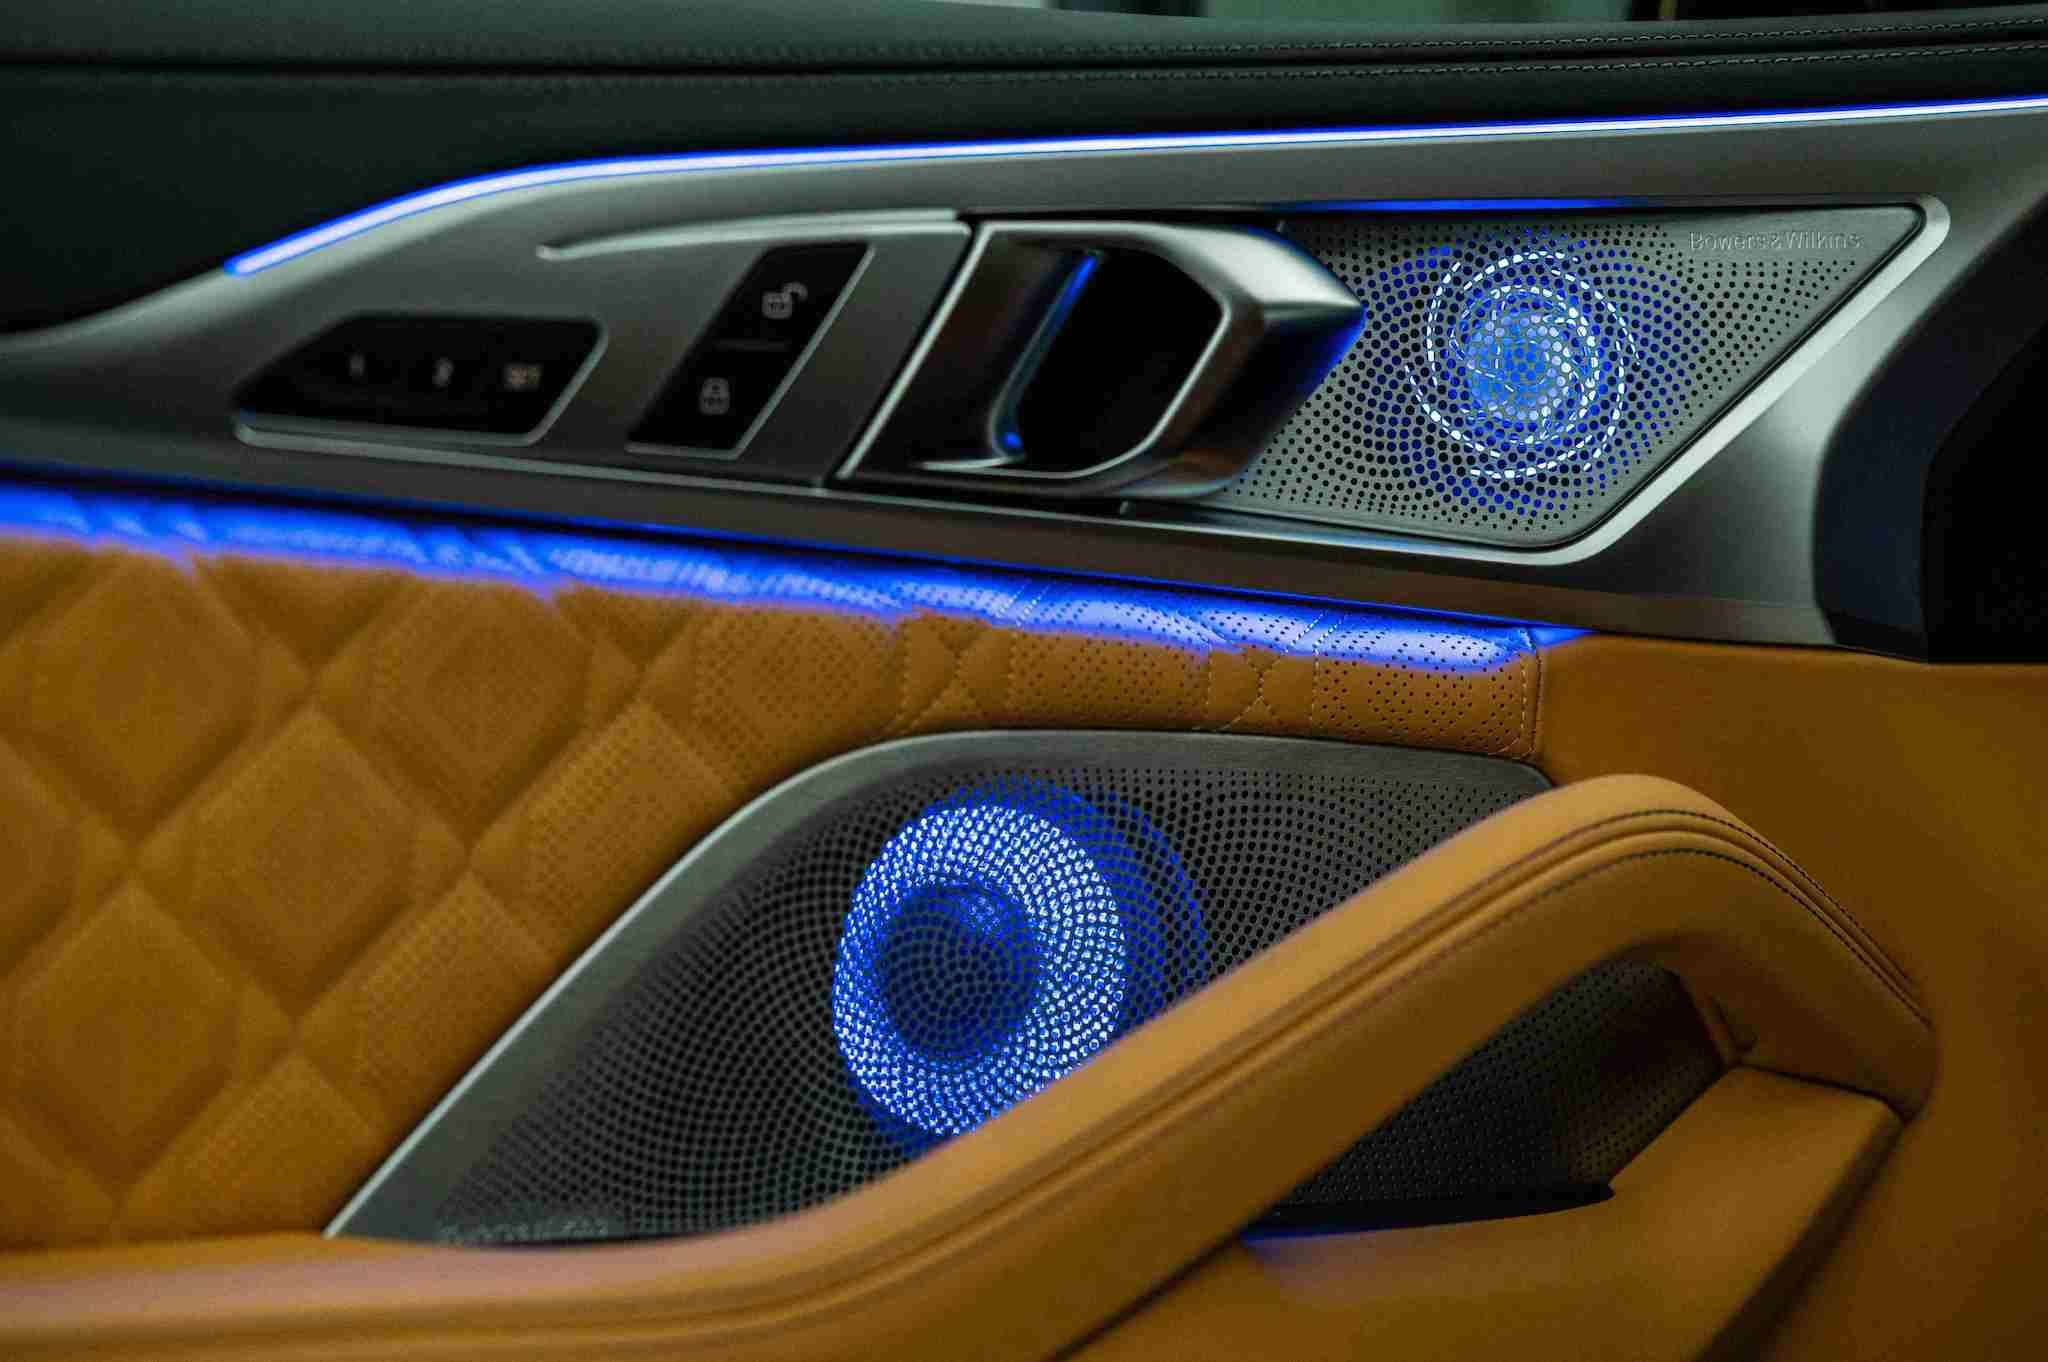 Bowers & Wilkins 鑽石高傳真音響系統,頂級出色的 16 支揚聲器。